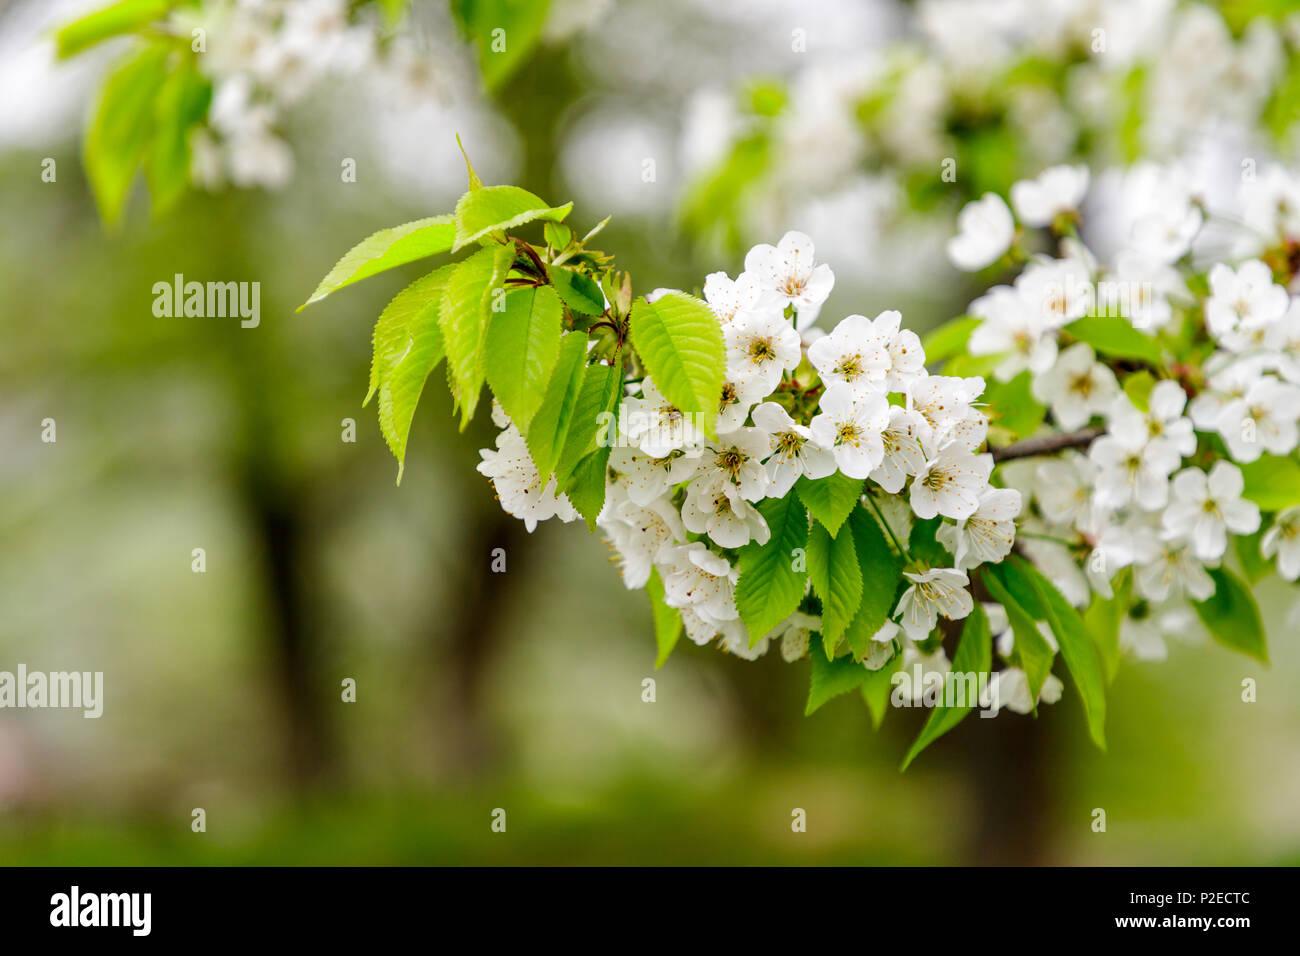 Beautiful cherry blossom (Cerasus avium) in spring time in nature. - Stock Image